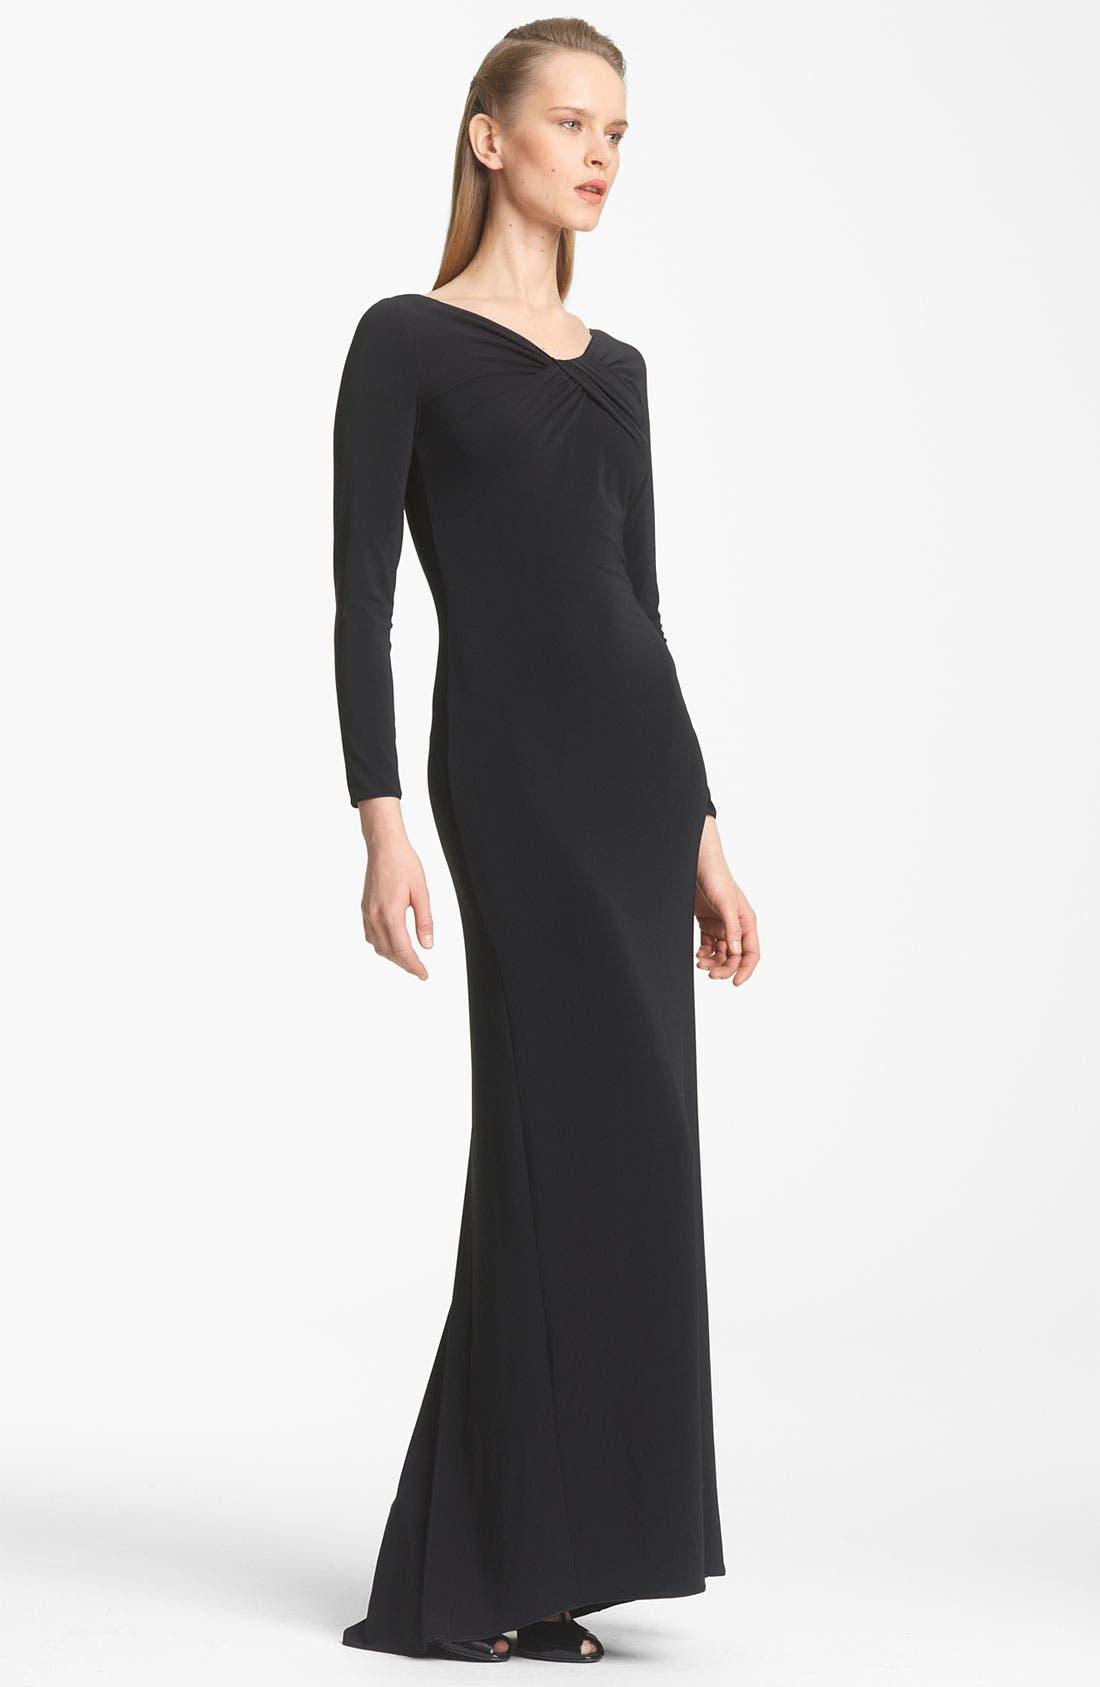 Alternate Image 1 Selected - Armani Collezioni Twist Front Matte Jersey Gown